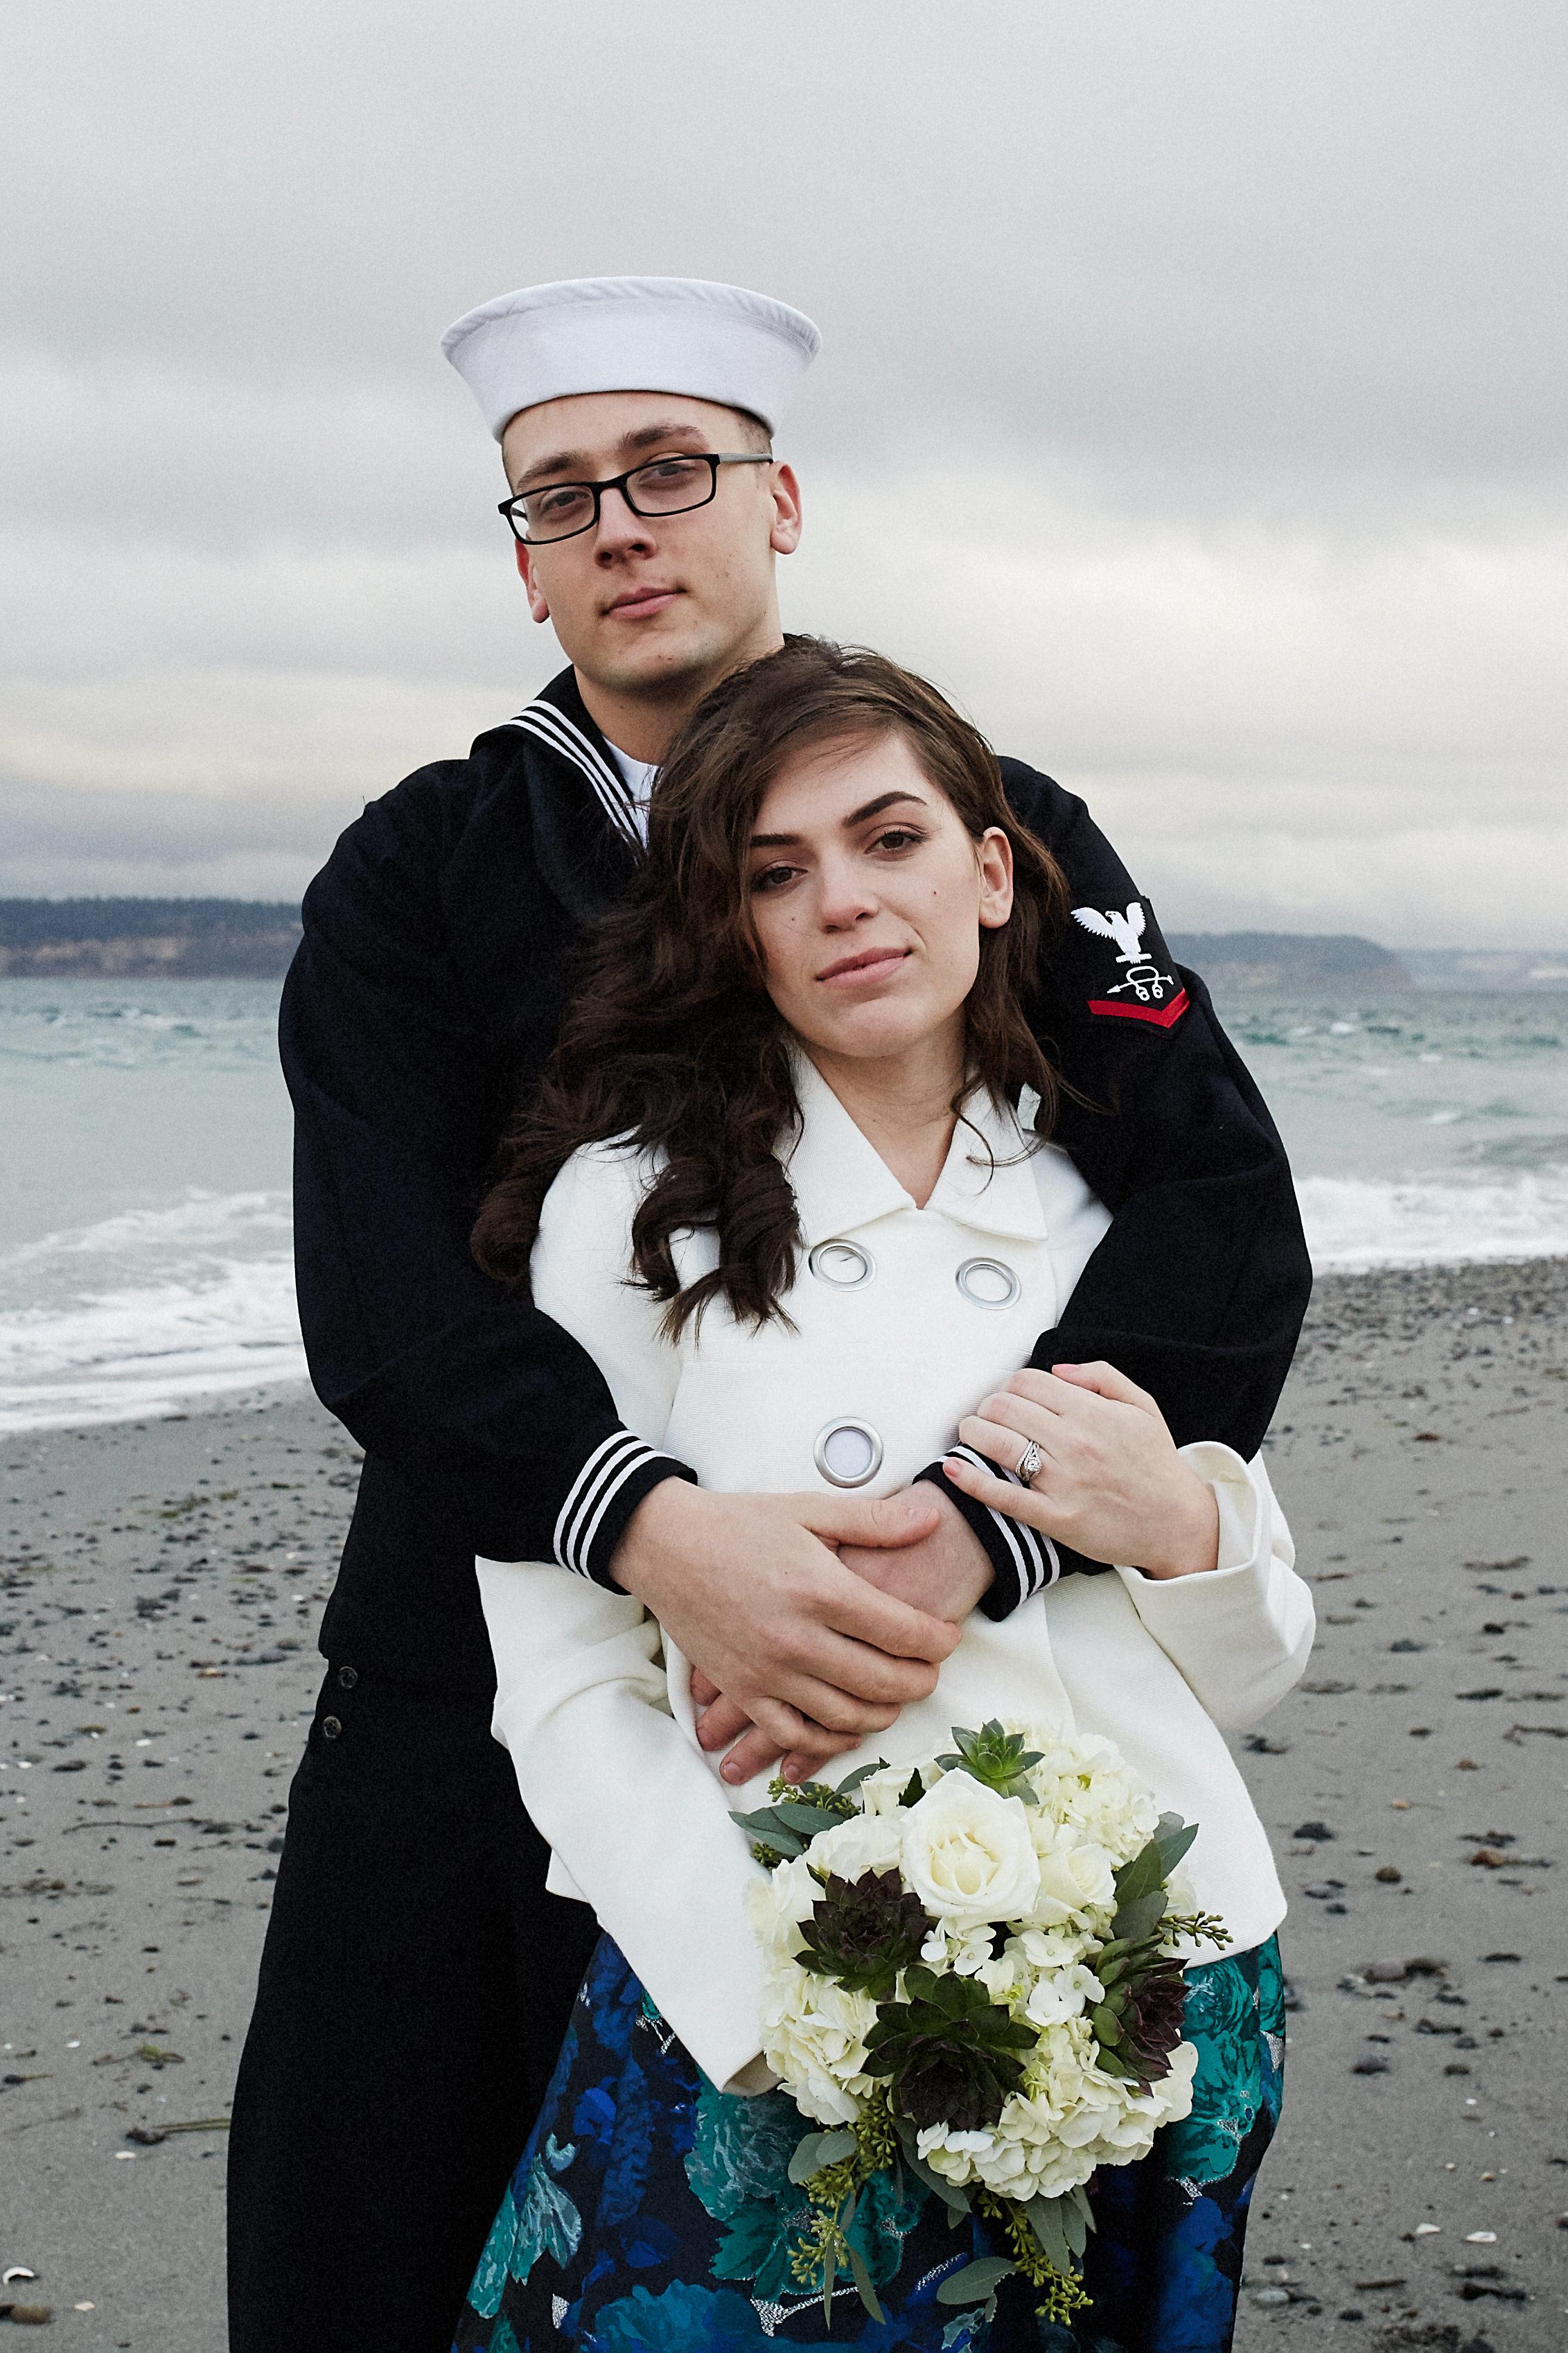 FELICIA_KAISER_WEDDING 31.jpg